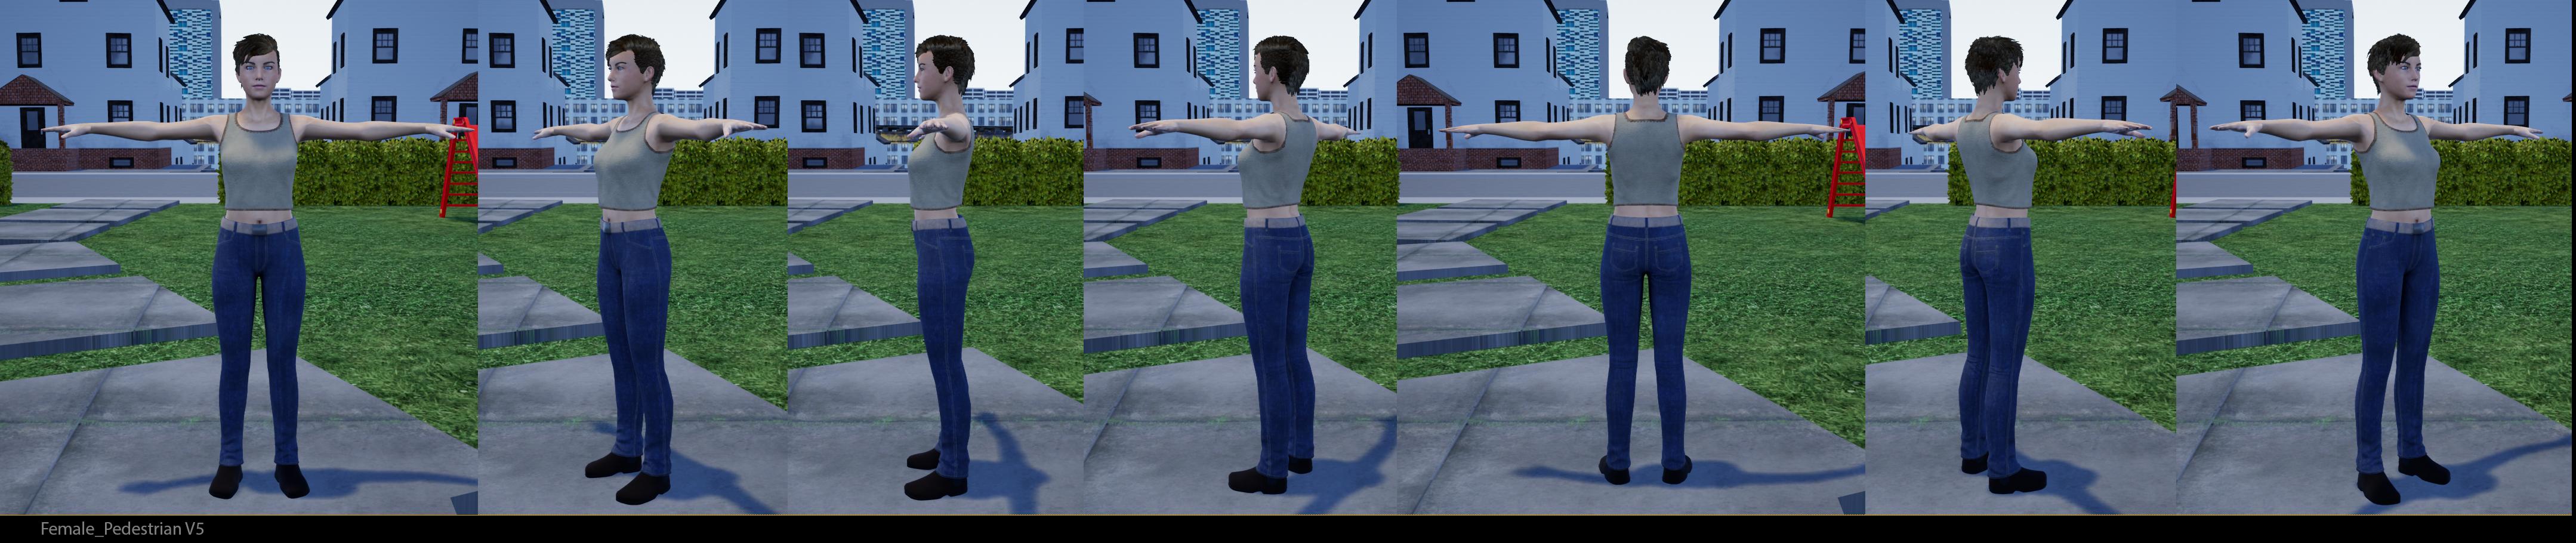 CARLA 0 9 6 release - CARLA Simulator